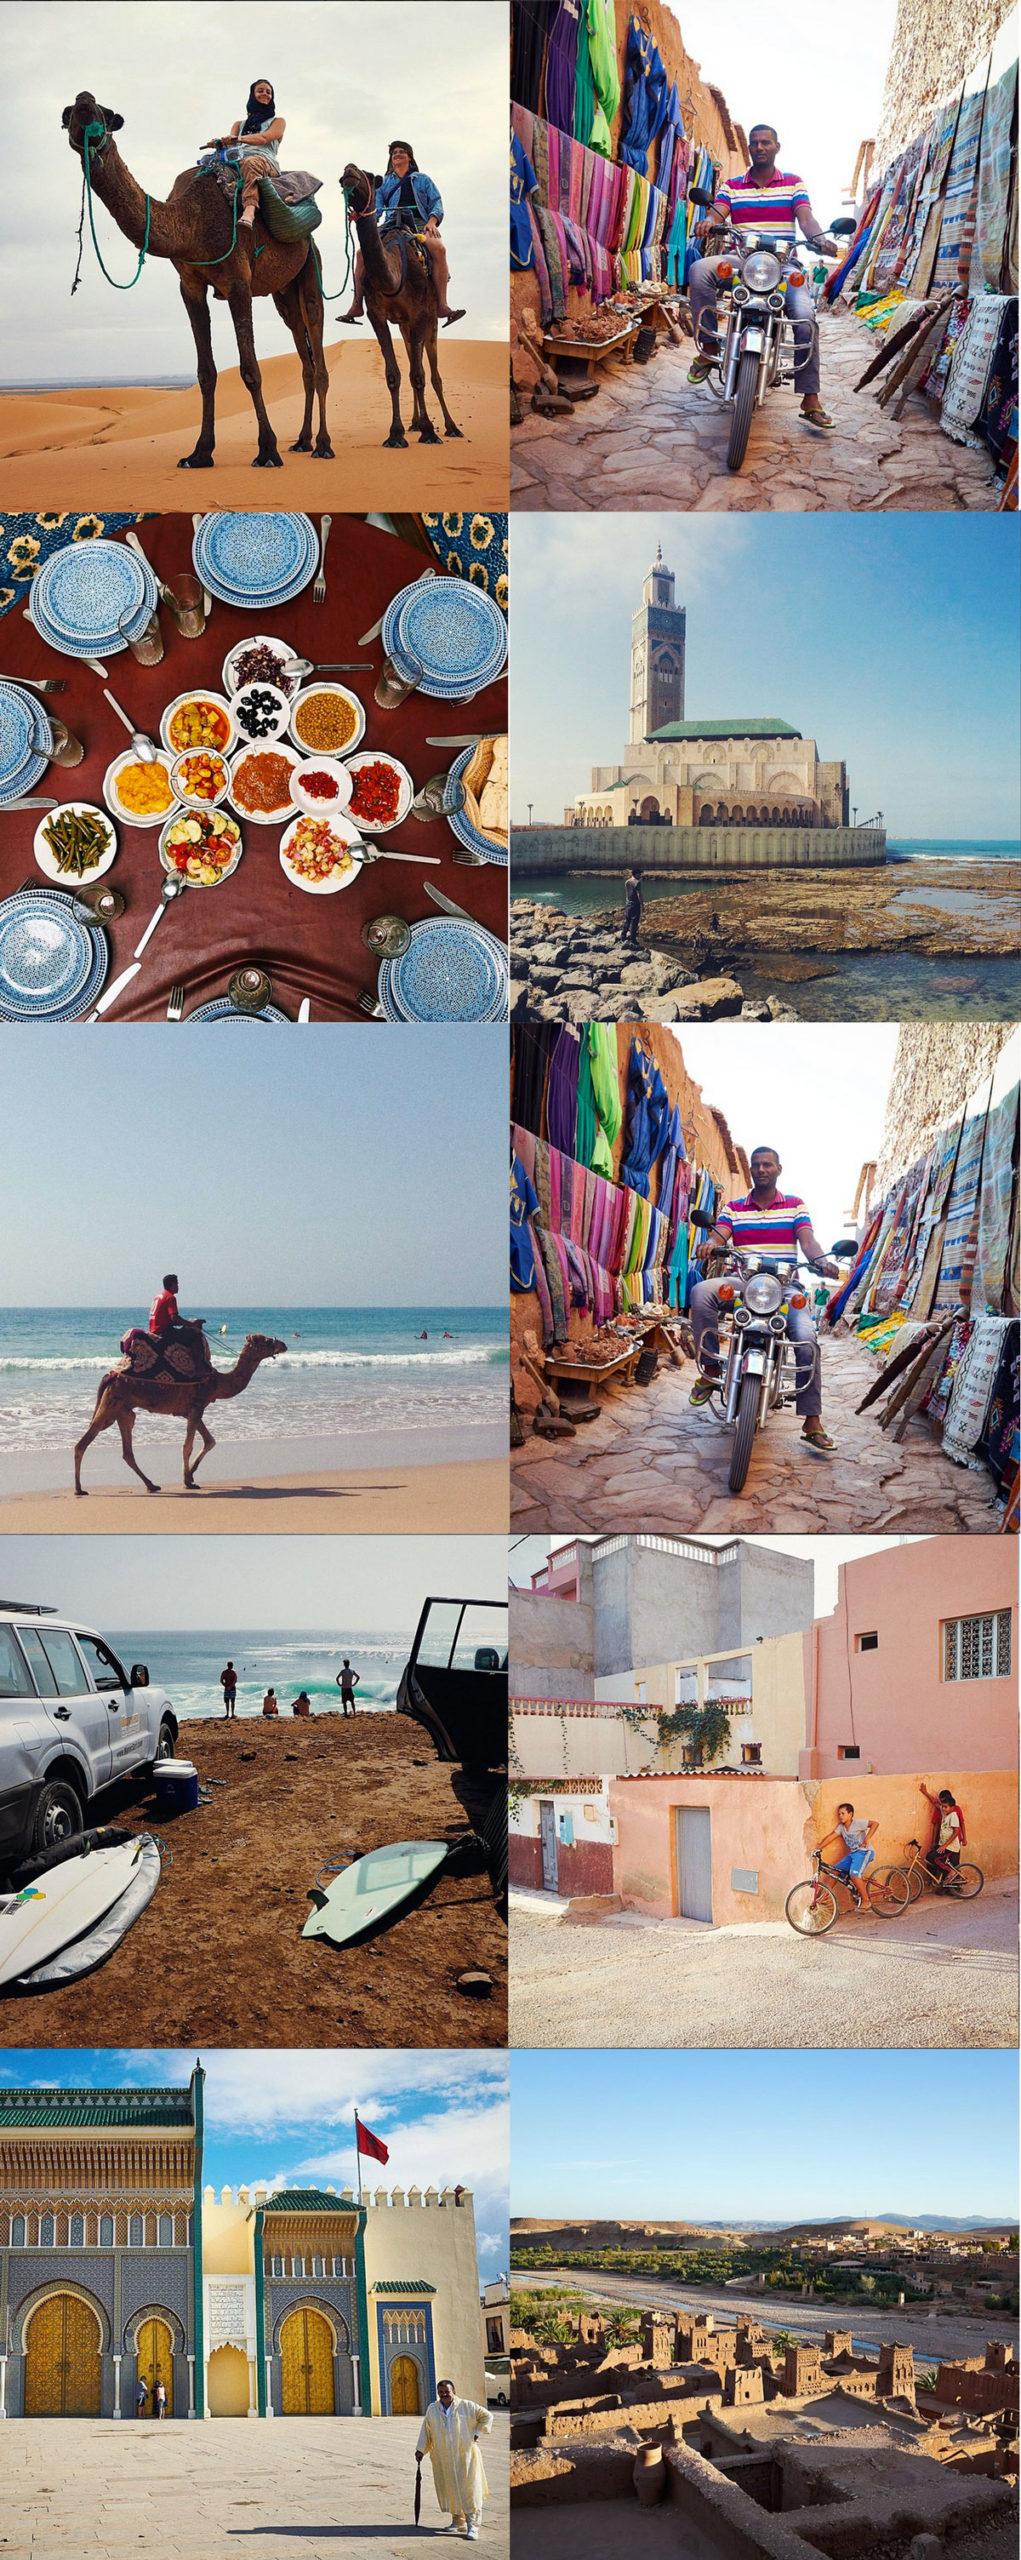 marocco-image-mix-pvdnl